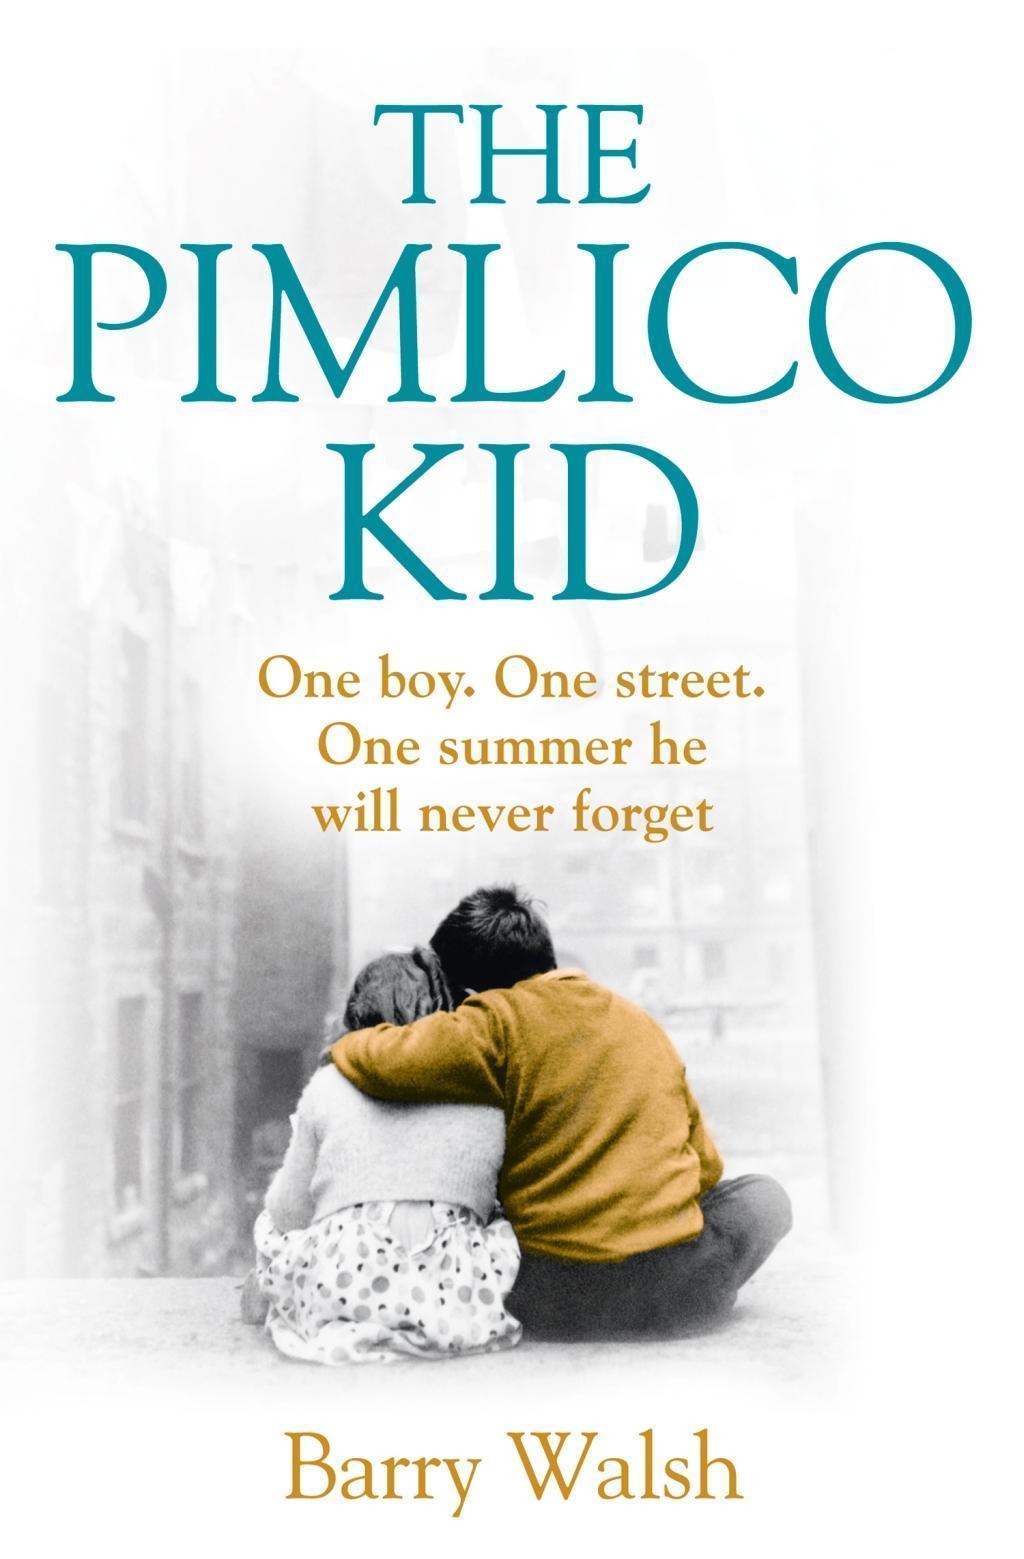 The Pimlico Kid